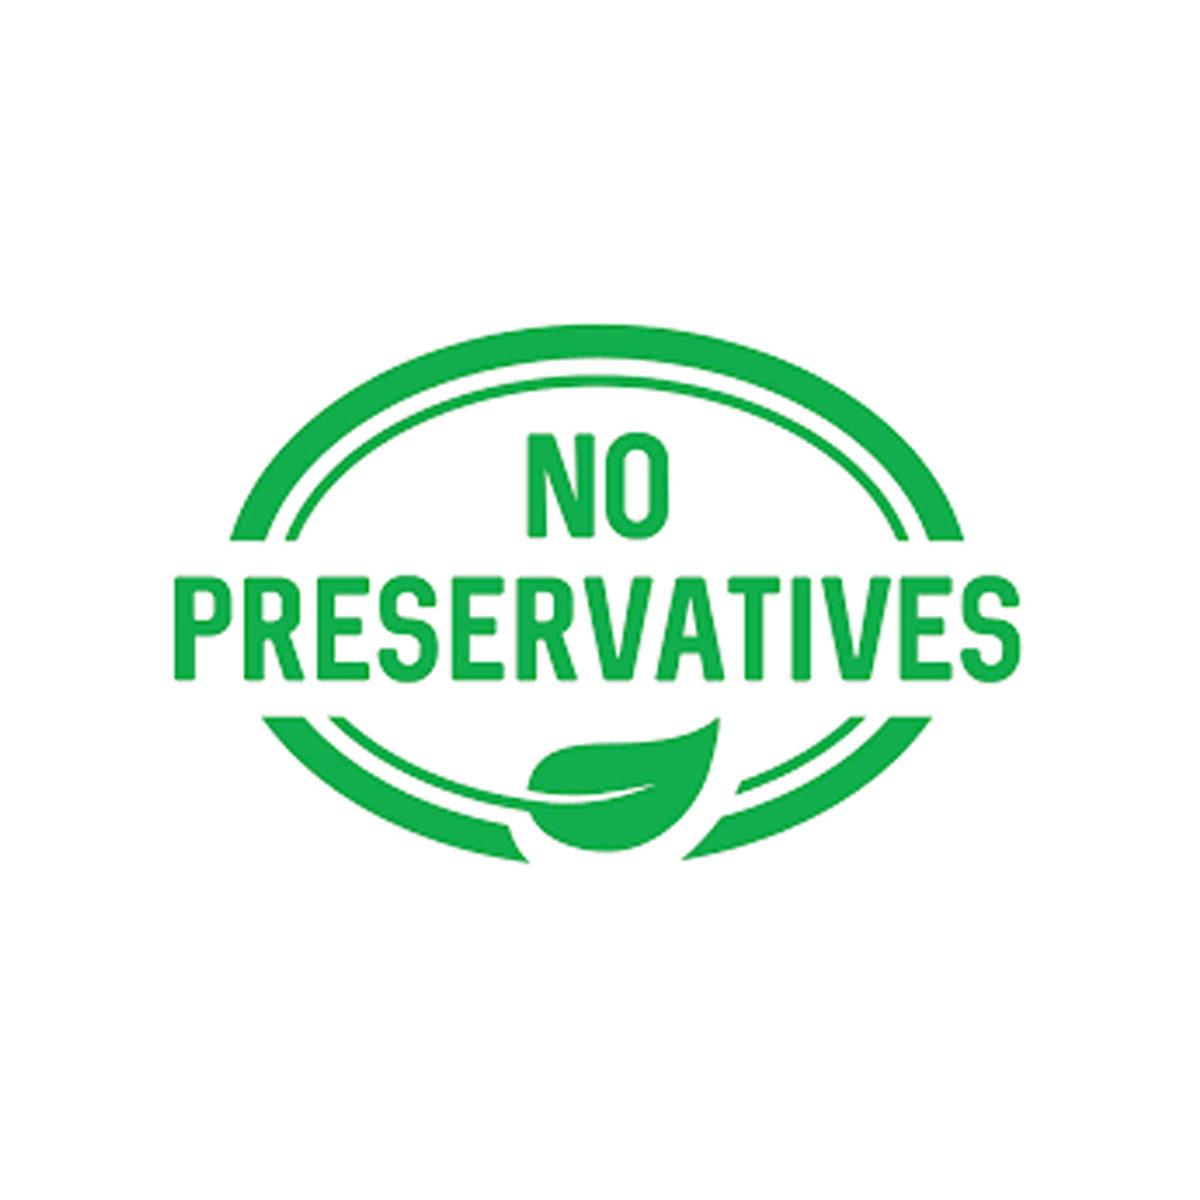 preserve5